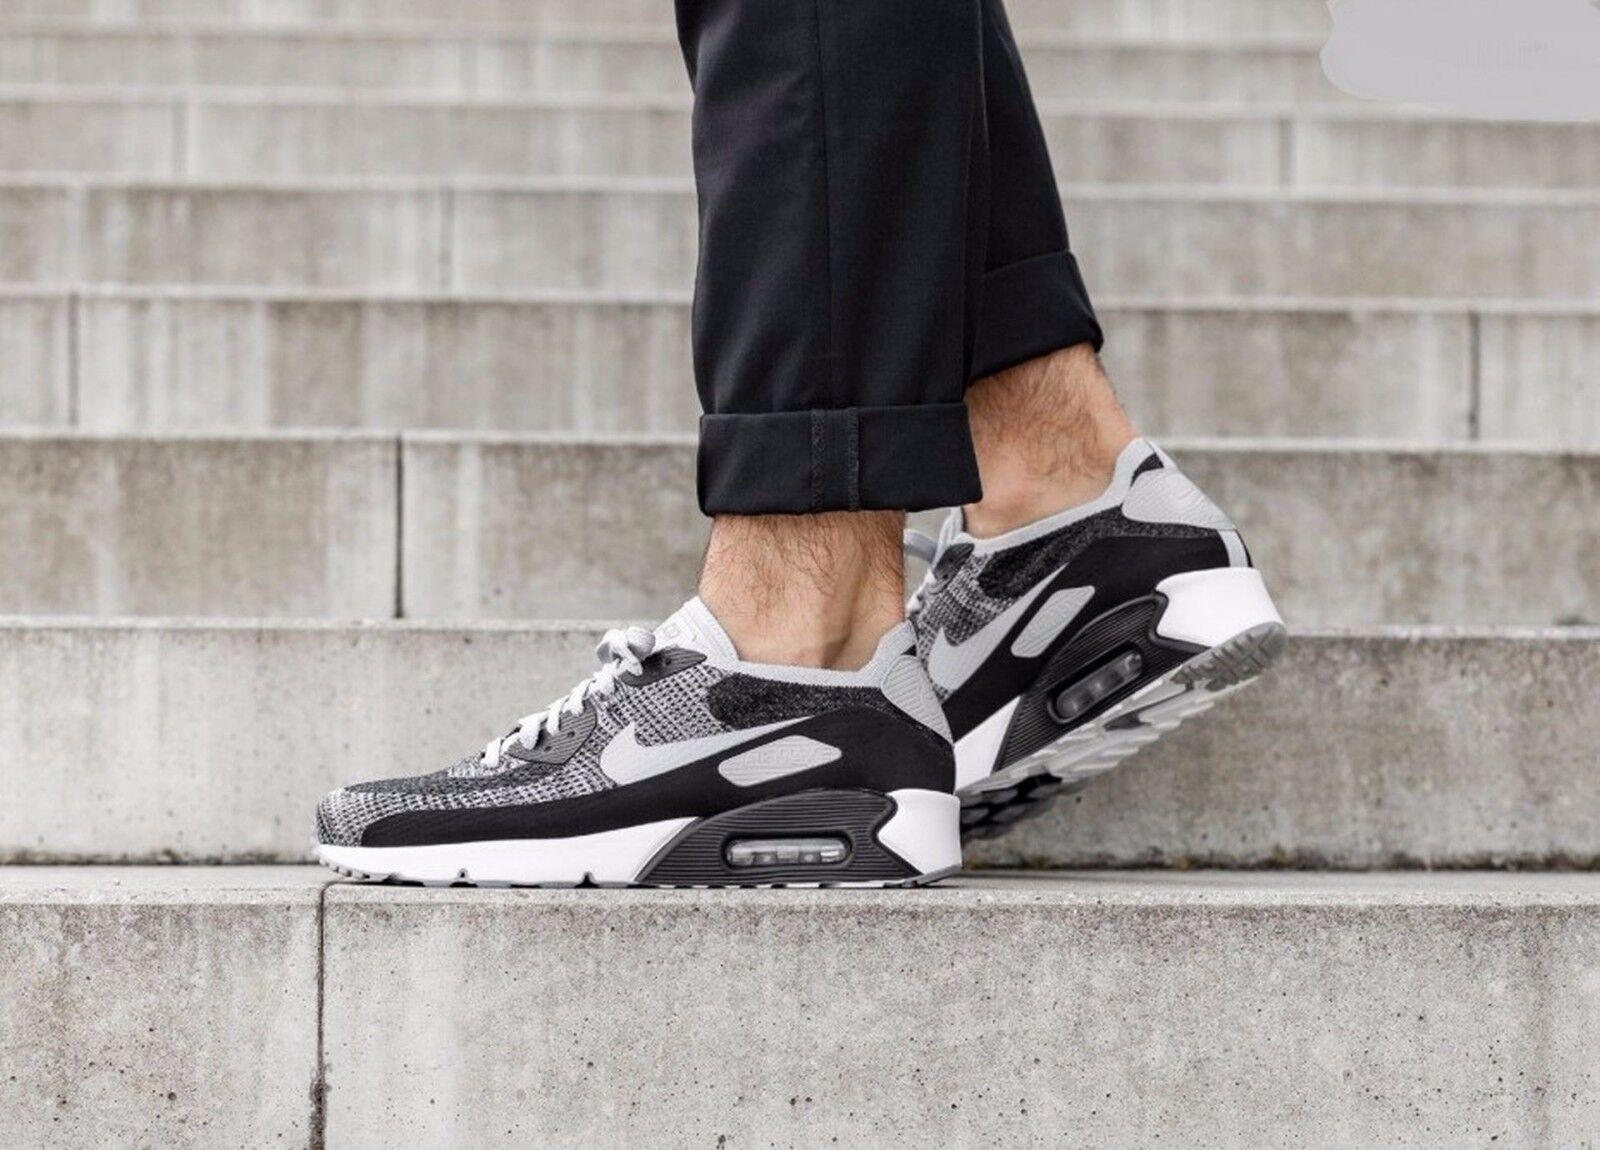 Nike air max 90 ultra - 2,0 flyknit Uomo bianco nero oreo 875943-005 Uomo flyknit sz 10 50974f